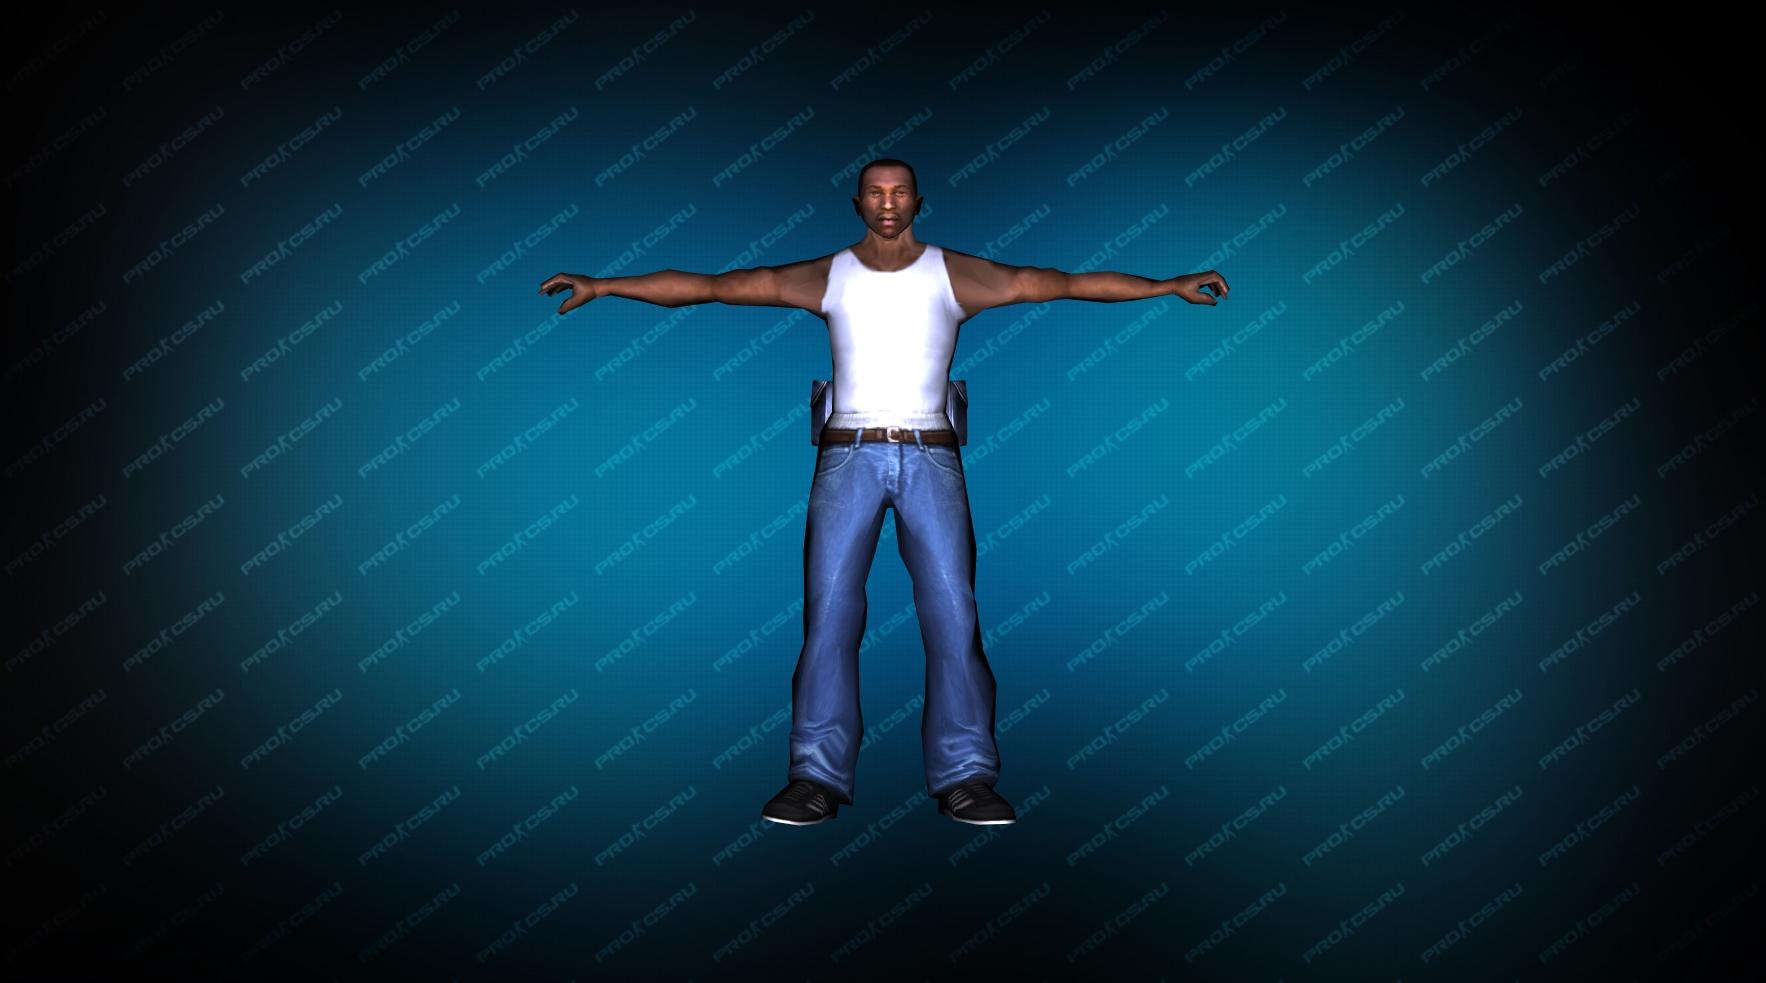 Модель игрока «Карл Джонсон» из GTA вид спереди